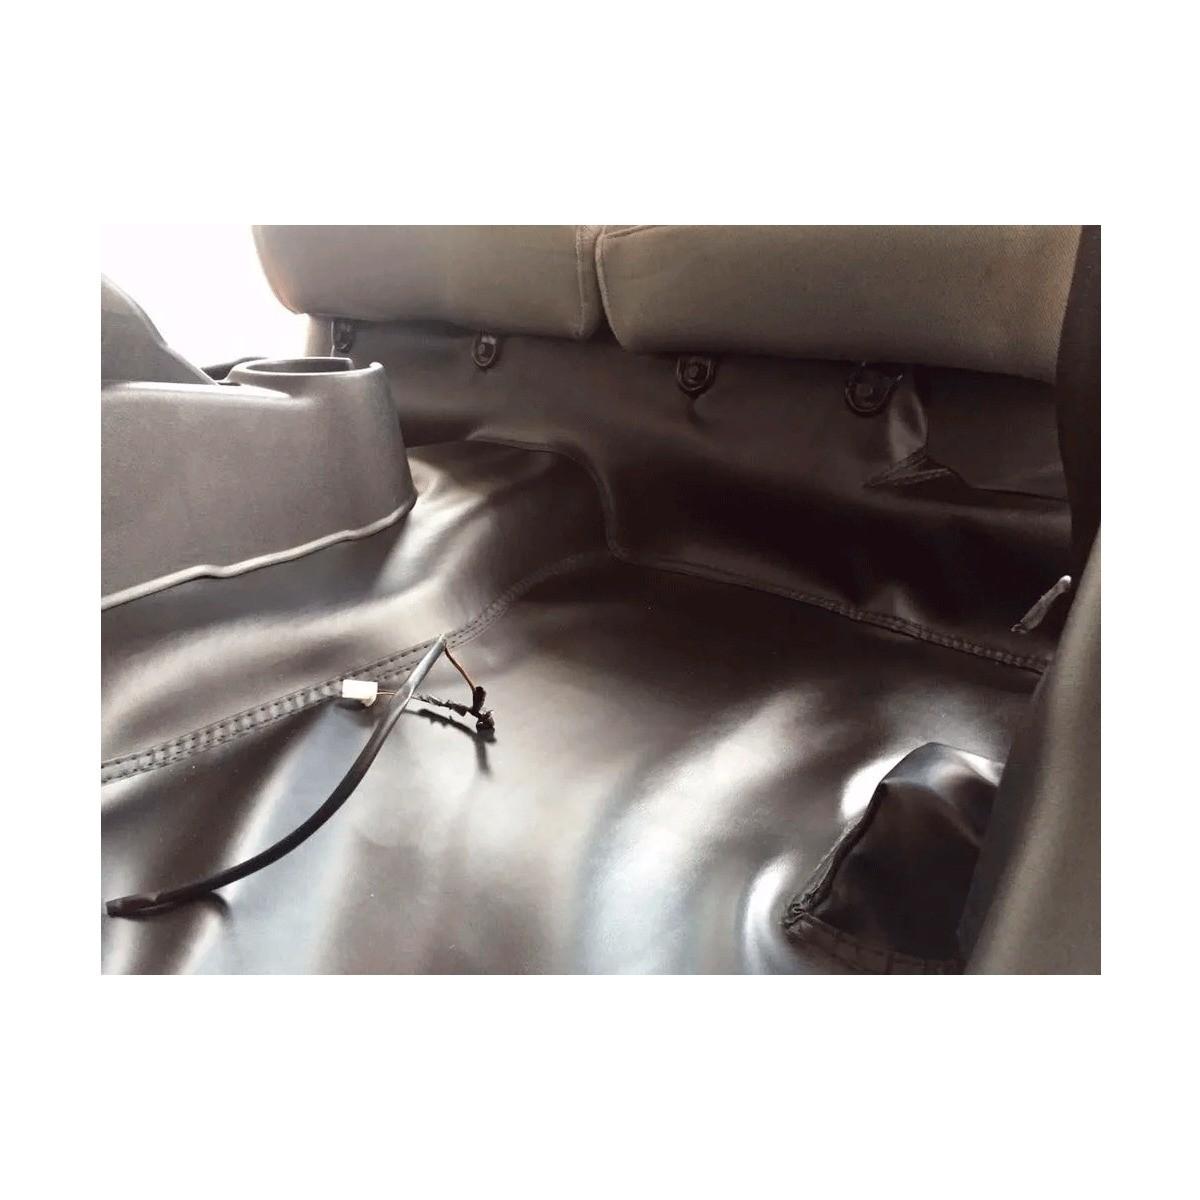 Tapete Automotivo Assoalho Emborrachado Bidim Chevrolet Vectra 2006 a 2011